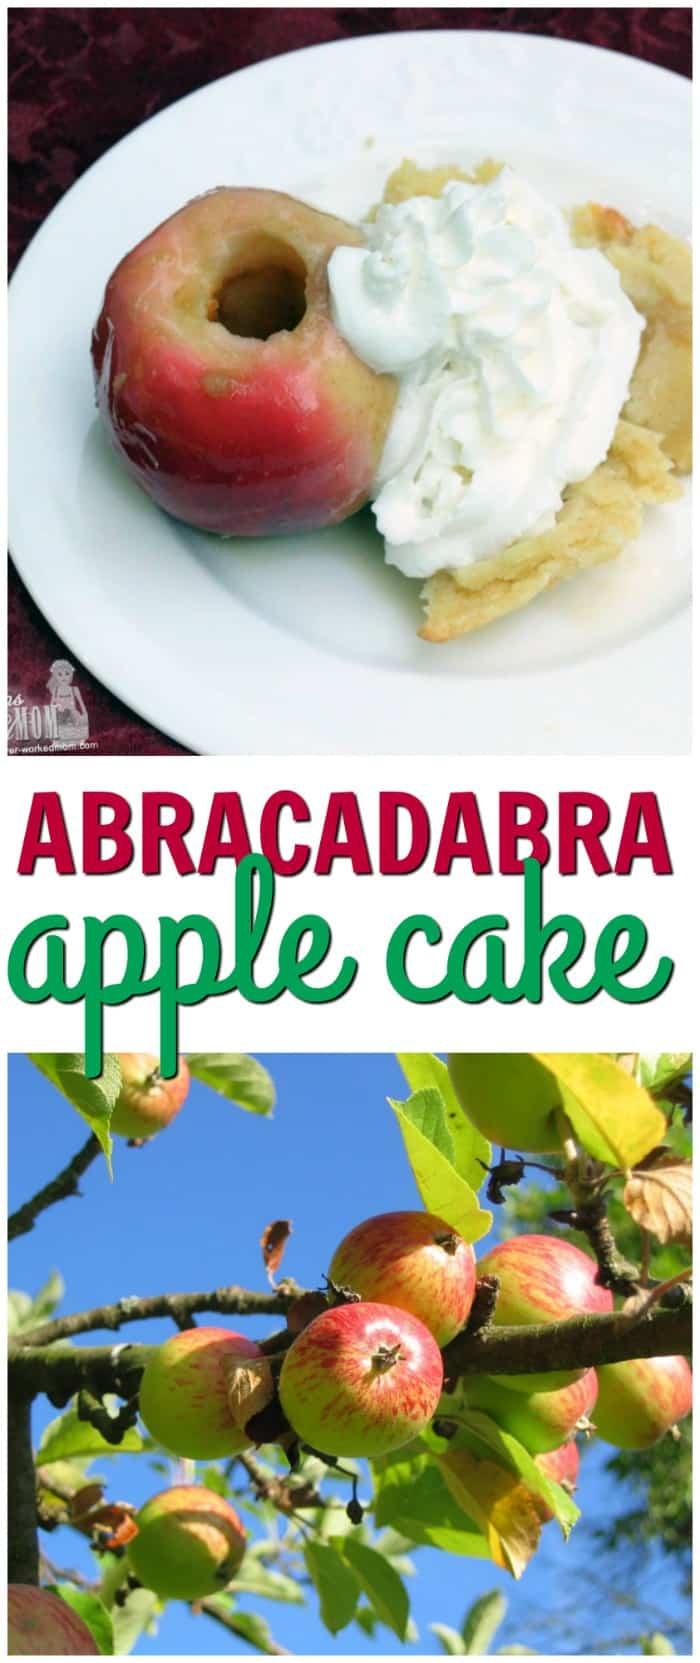 Easy Apple Recipes: Apple Abracadabra Cake